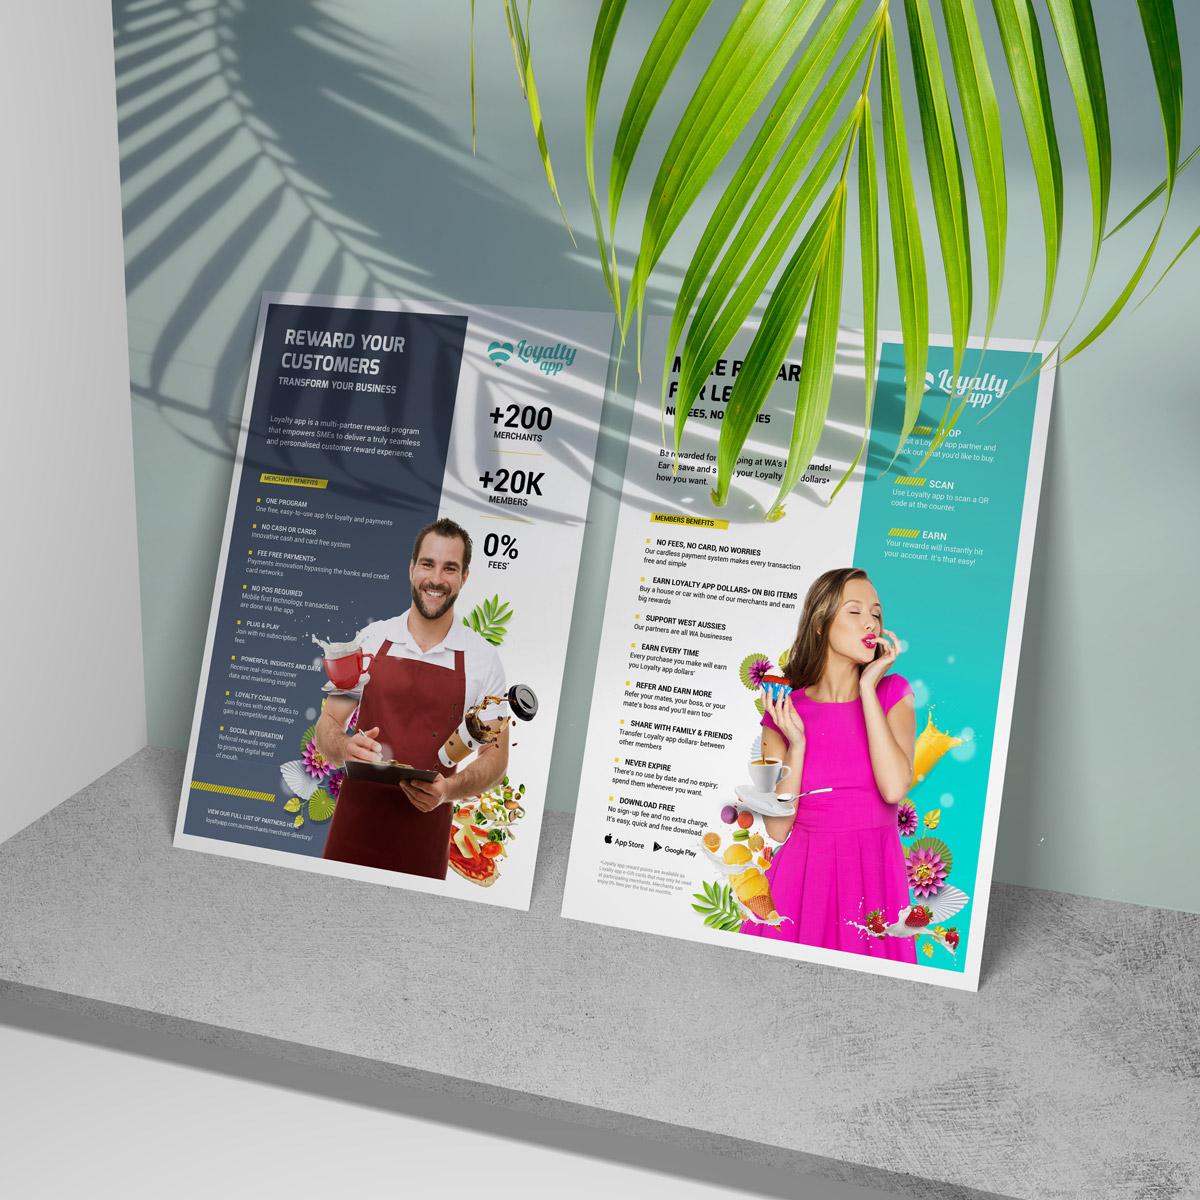 Modern-Branding-Vertical-Standing-Posters-Mockup-PSD-Template.jpg